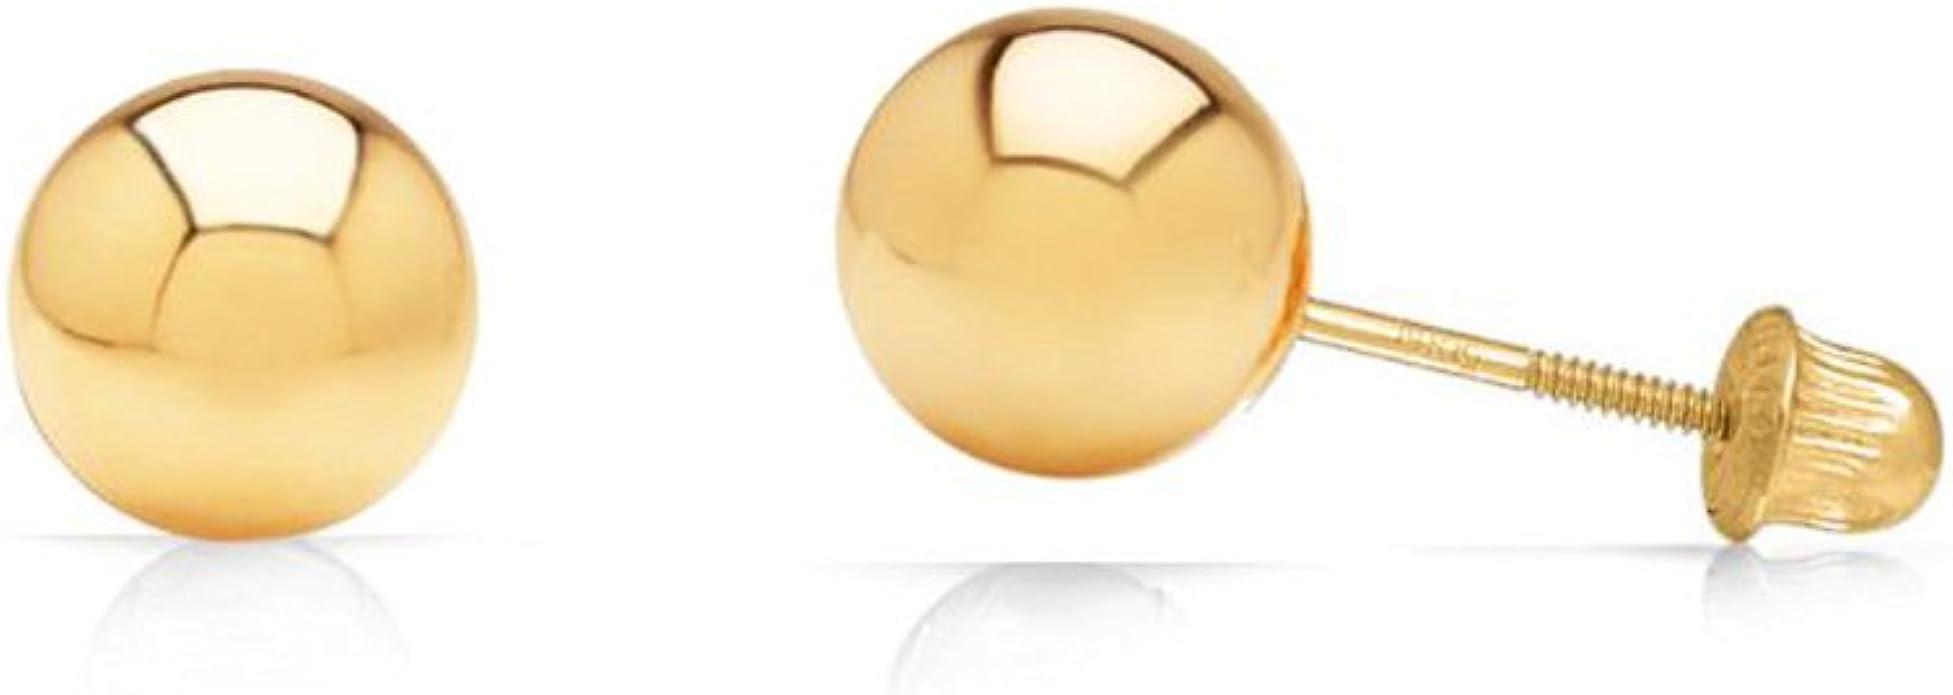 14k Solid Yellow Gold 10mm Black Onyx Bead Stud Earrings TPJ